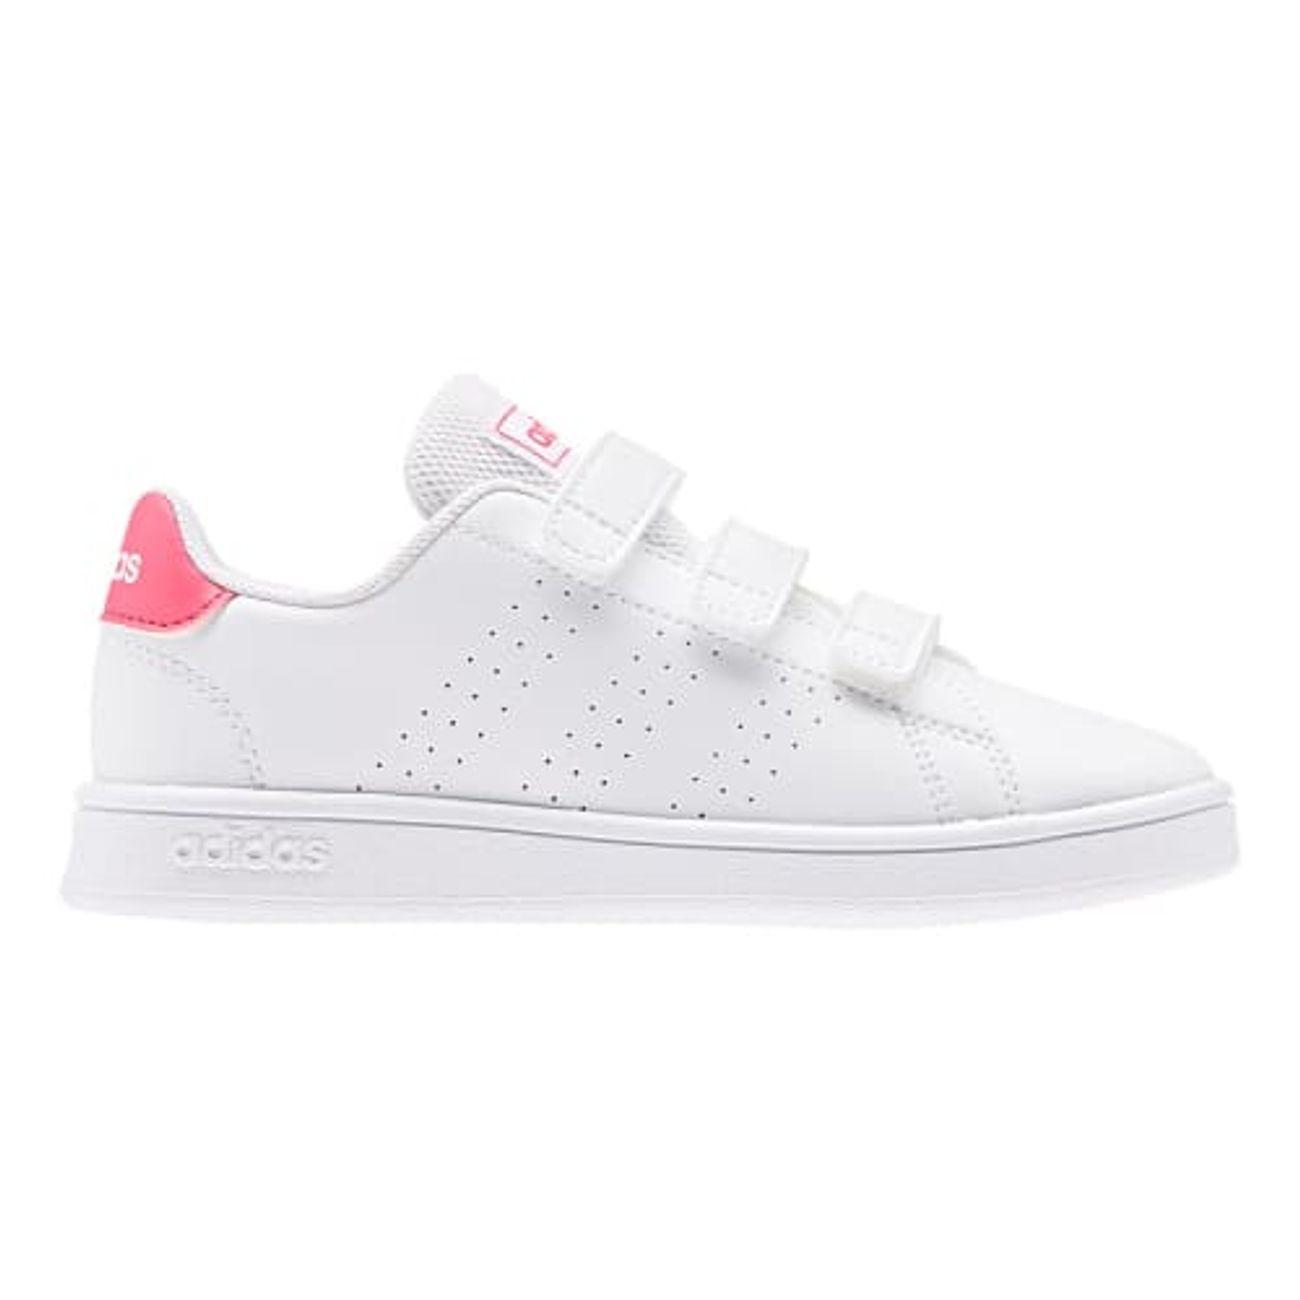 Mode- Lifestyle homme ADIDAS Chaussures adidas Advantage blanc logo rose enfant